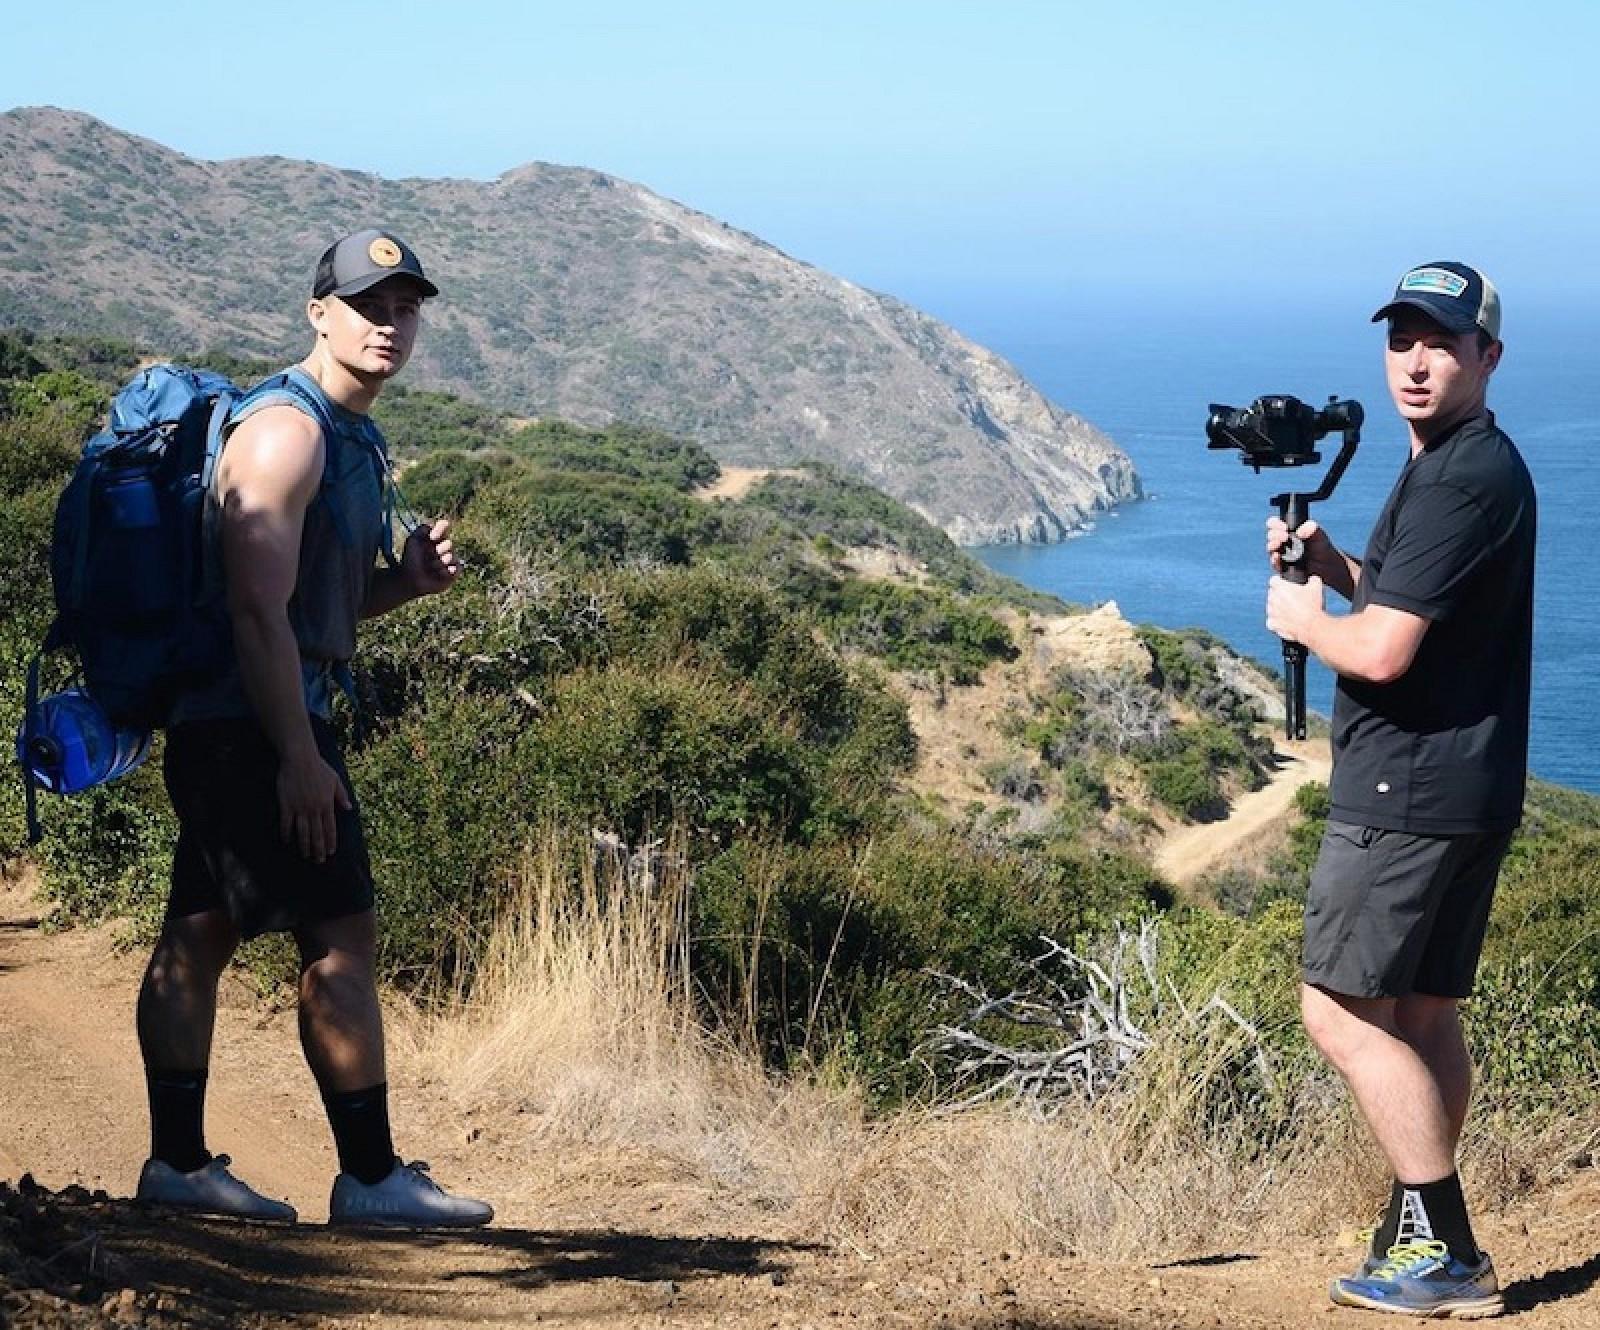 Trio of Friends Make Challenging Hike Across Catalina Island to Recreate the macOS Catalina Wallpaper - MacRumors